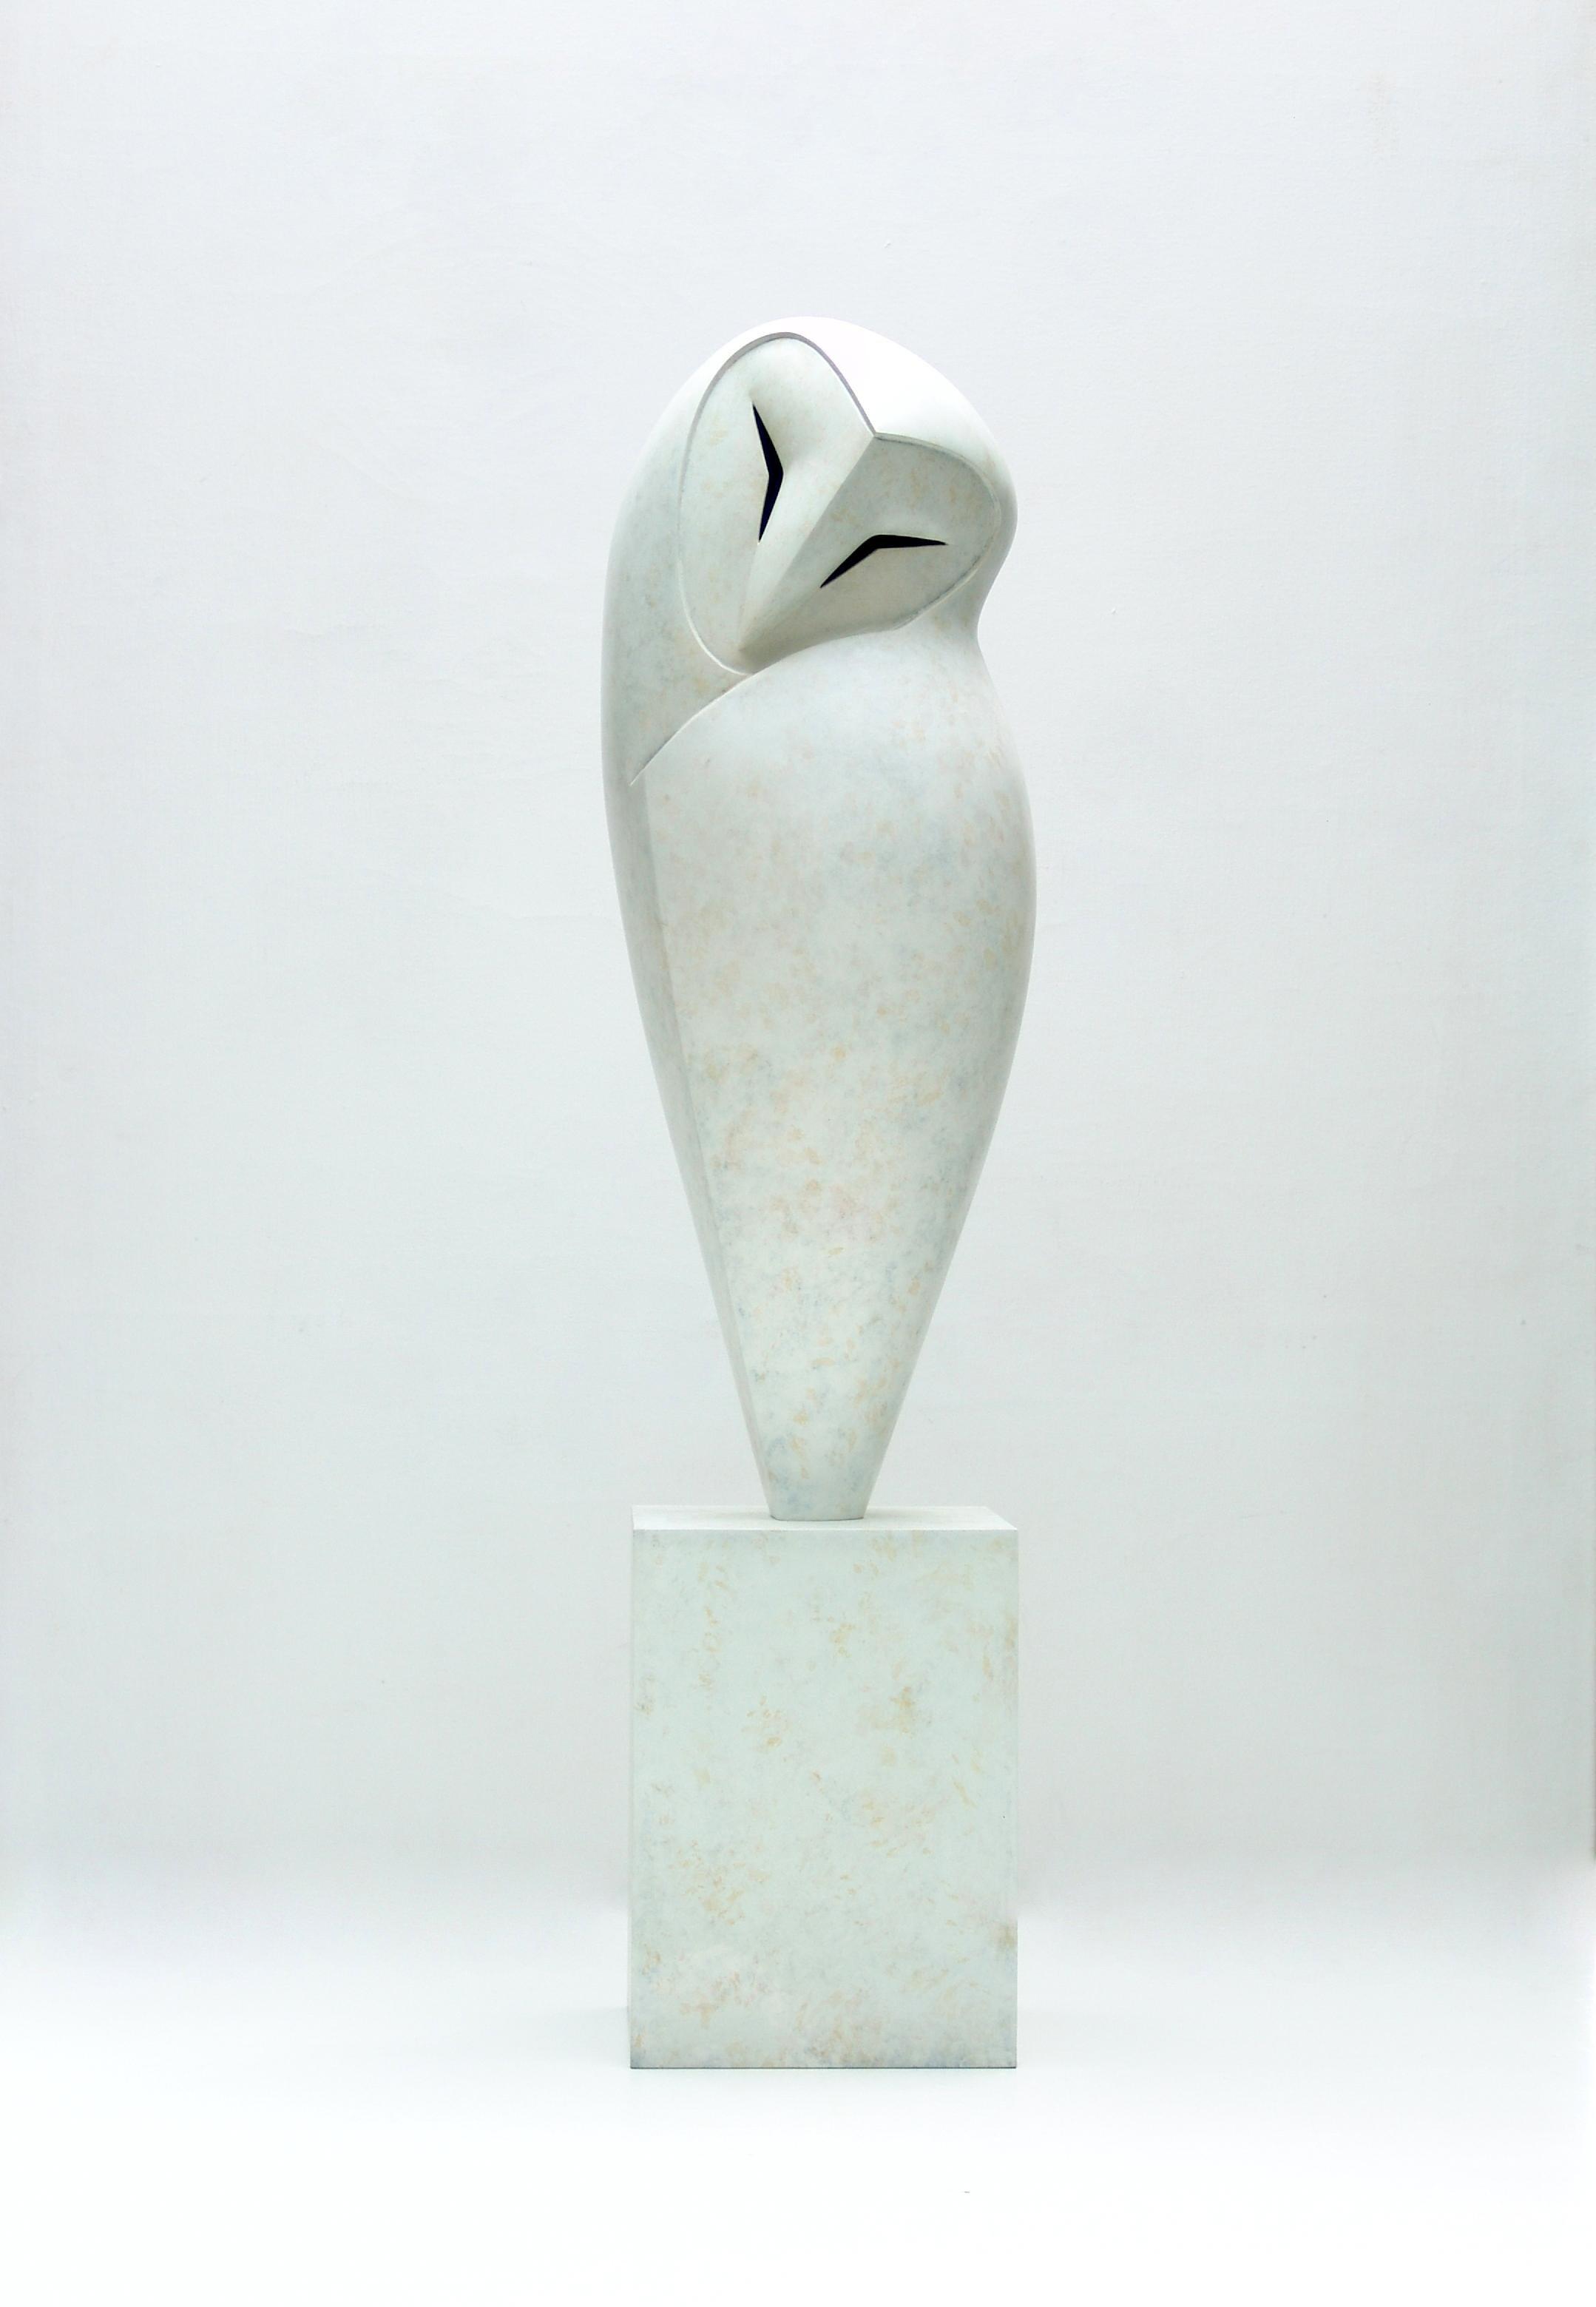 """Peaceful"" Contemporary Bronze Sculpture Portrait of a White Owl"